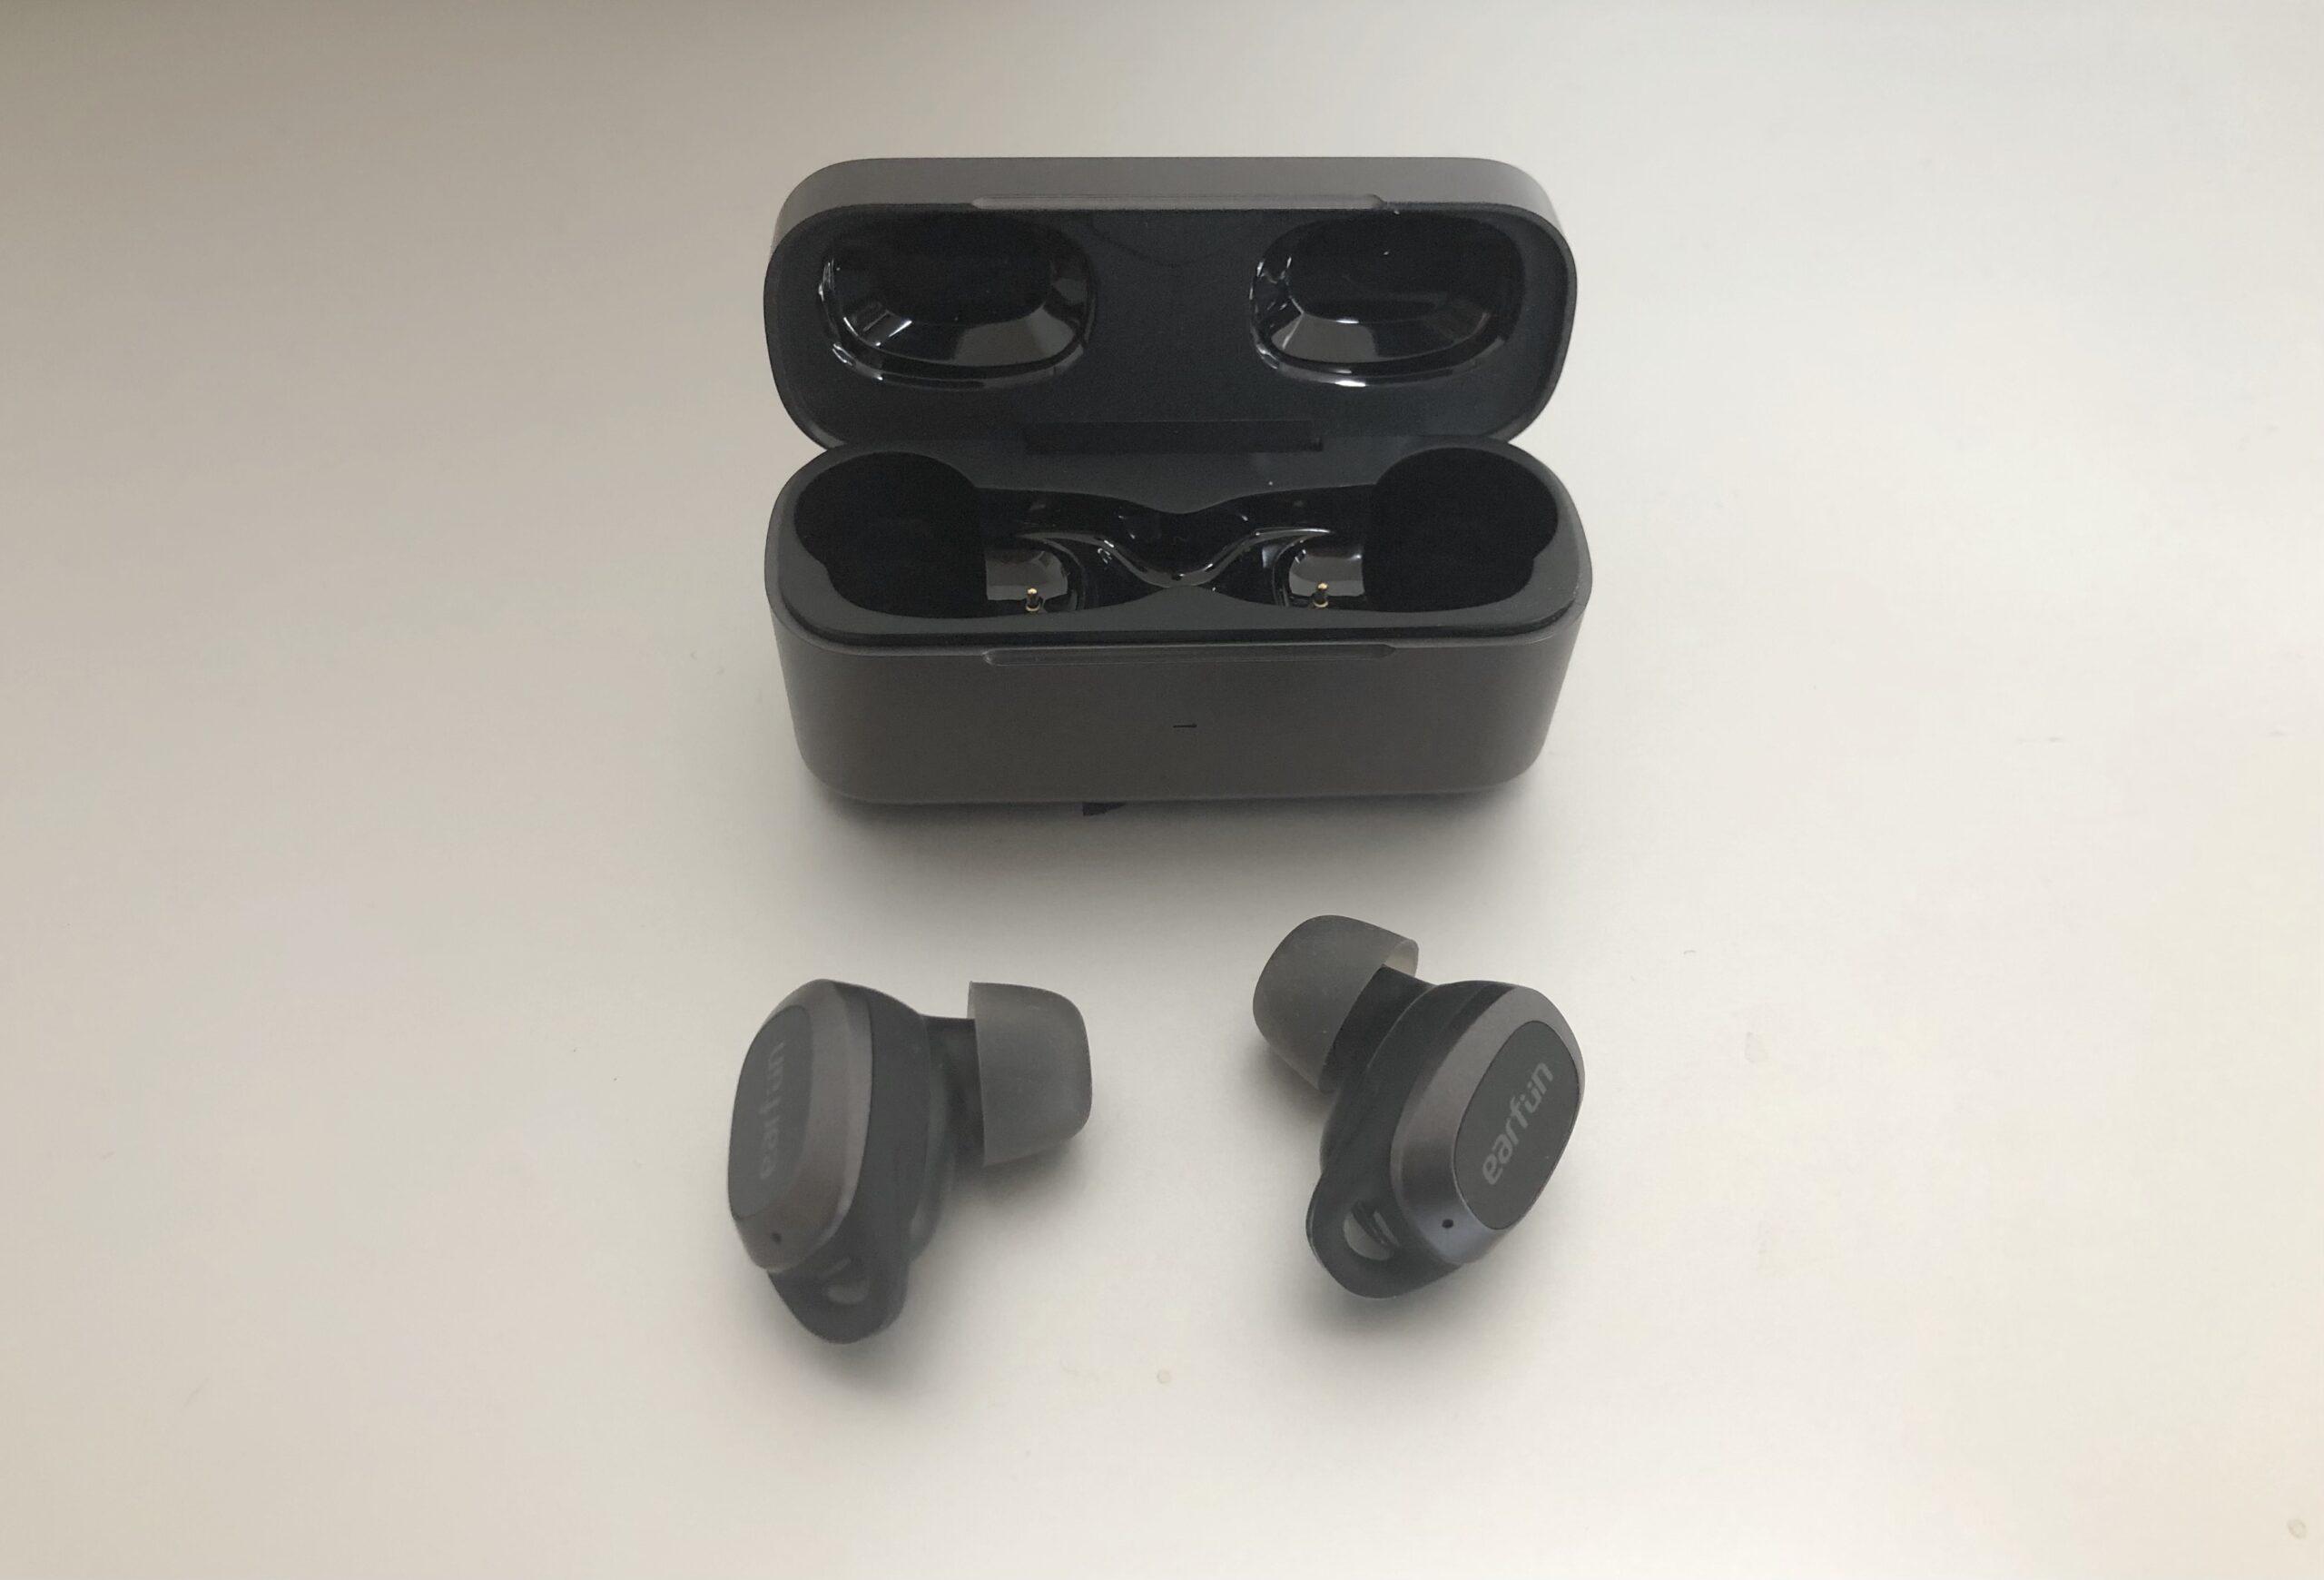 EarFun Free Preのペアリング・接続方法